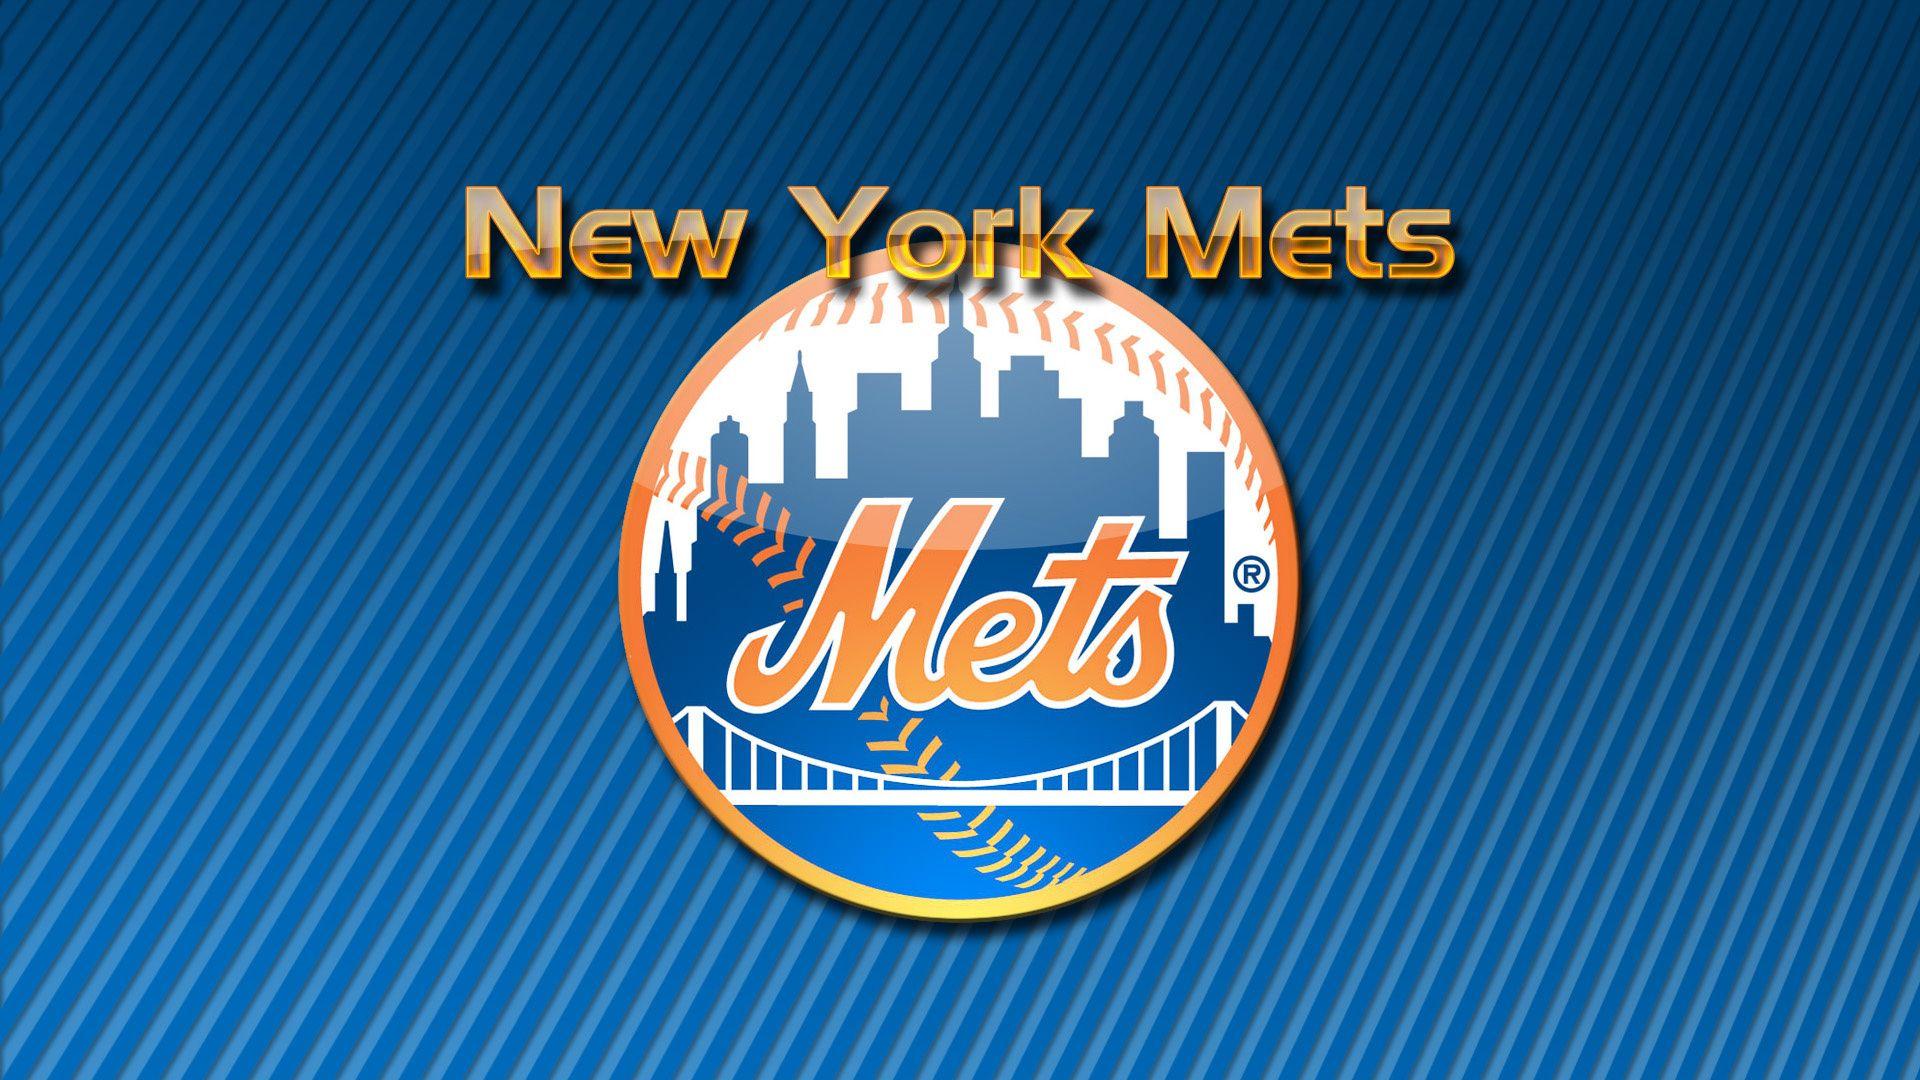 New York Mets wallpaper hd